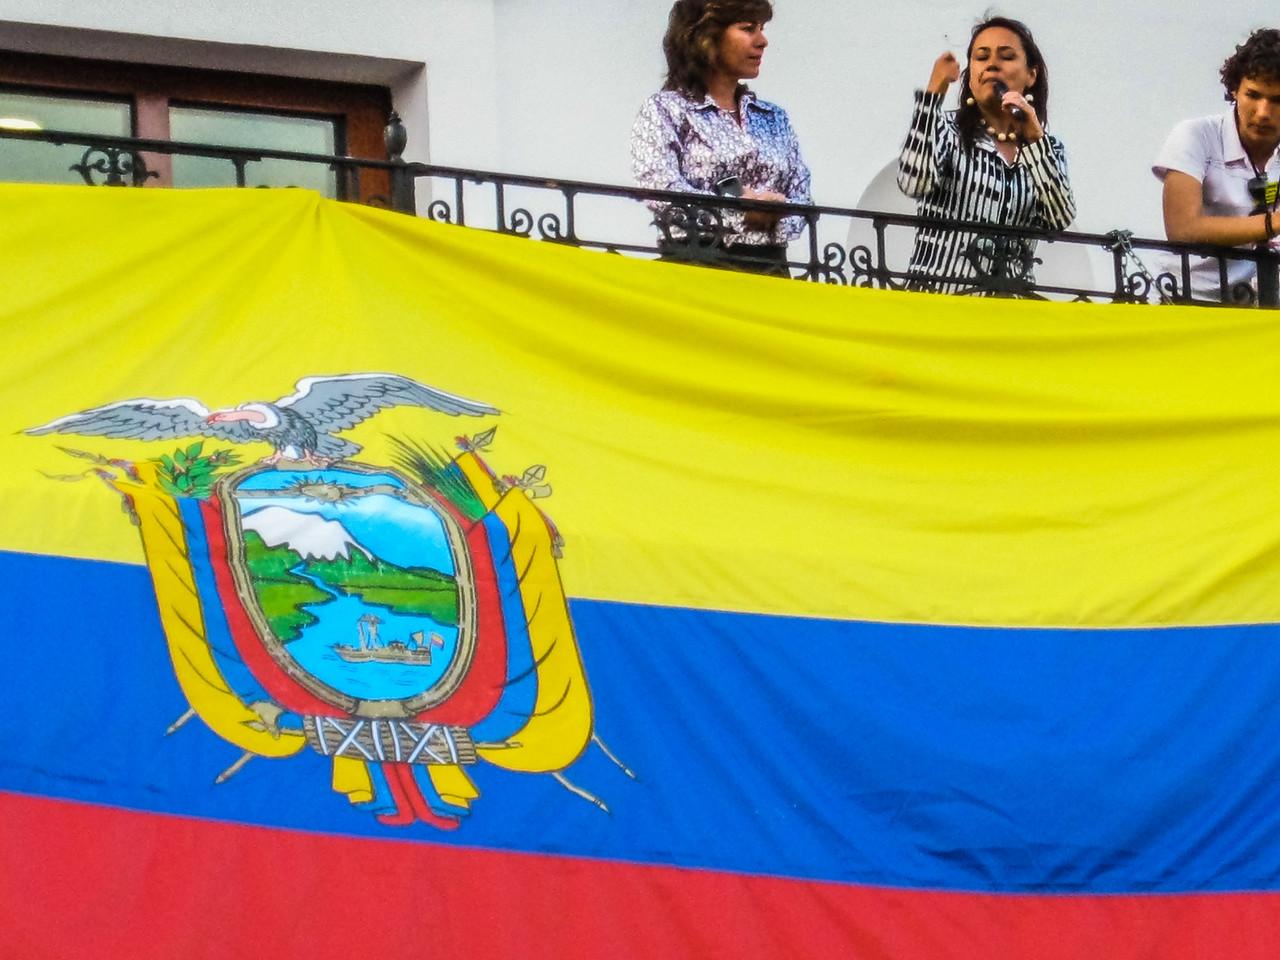 Politicians, Quito, Ecuador